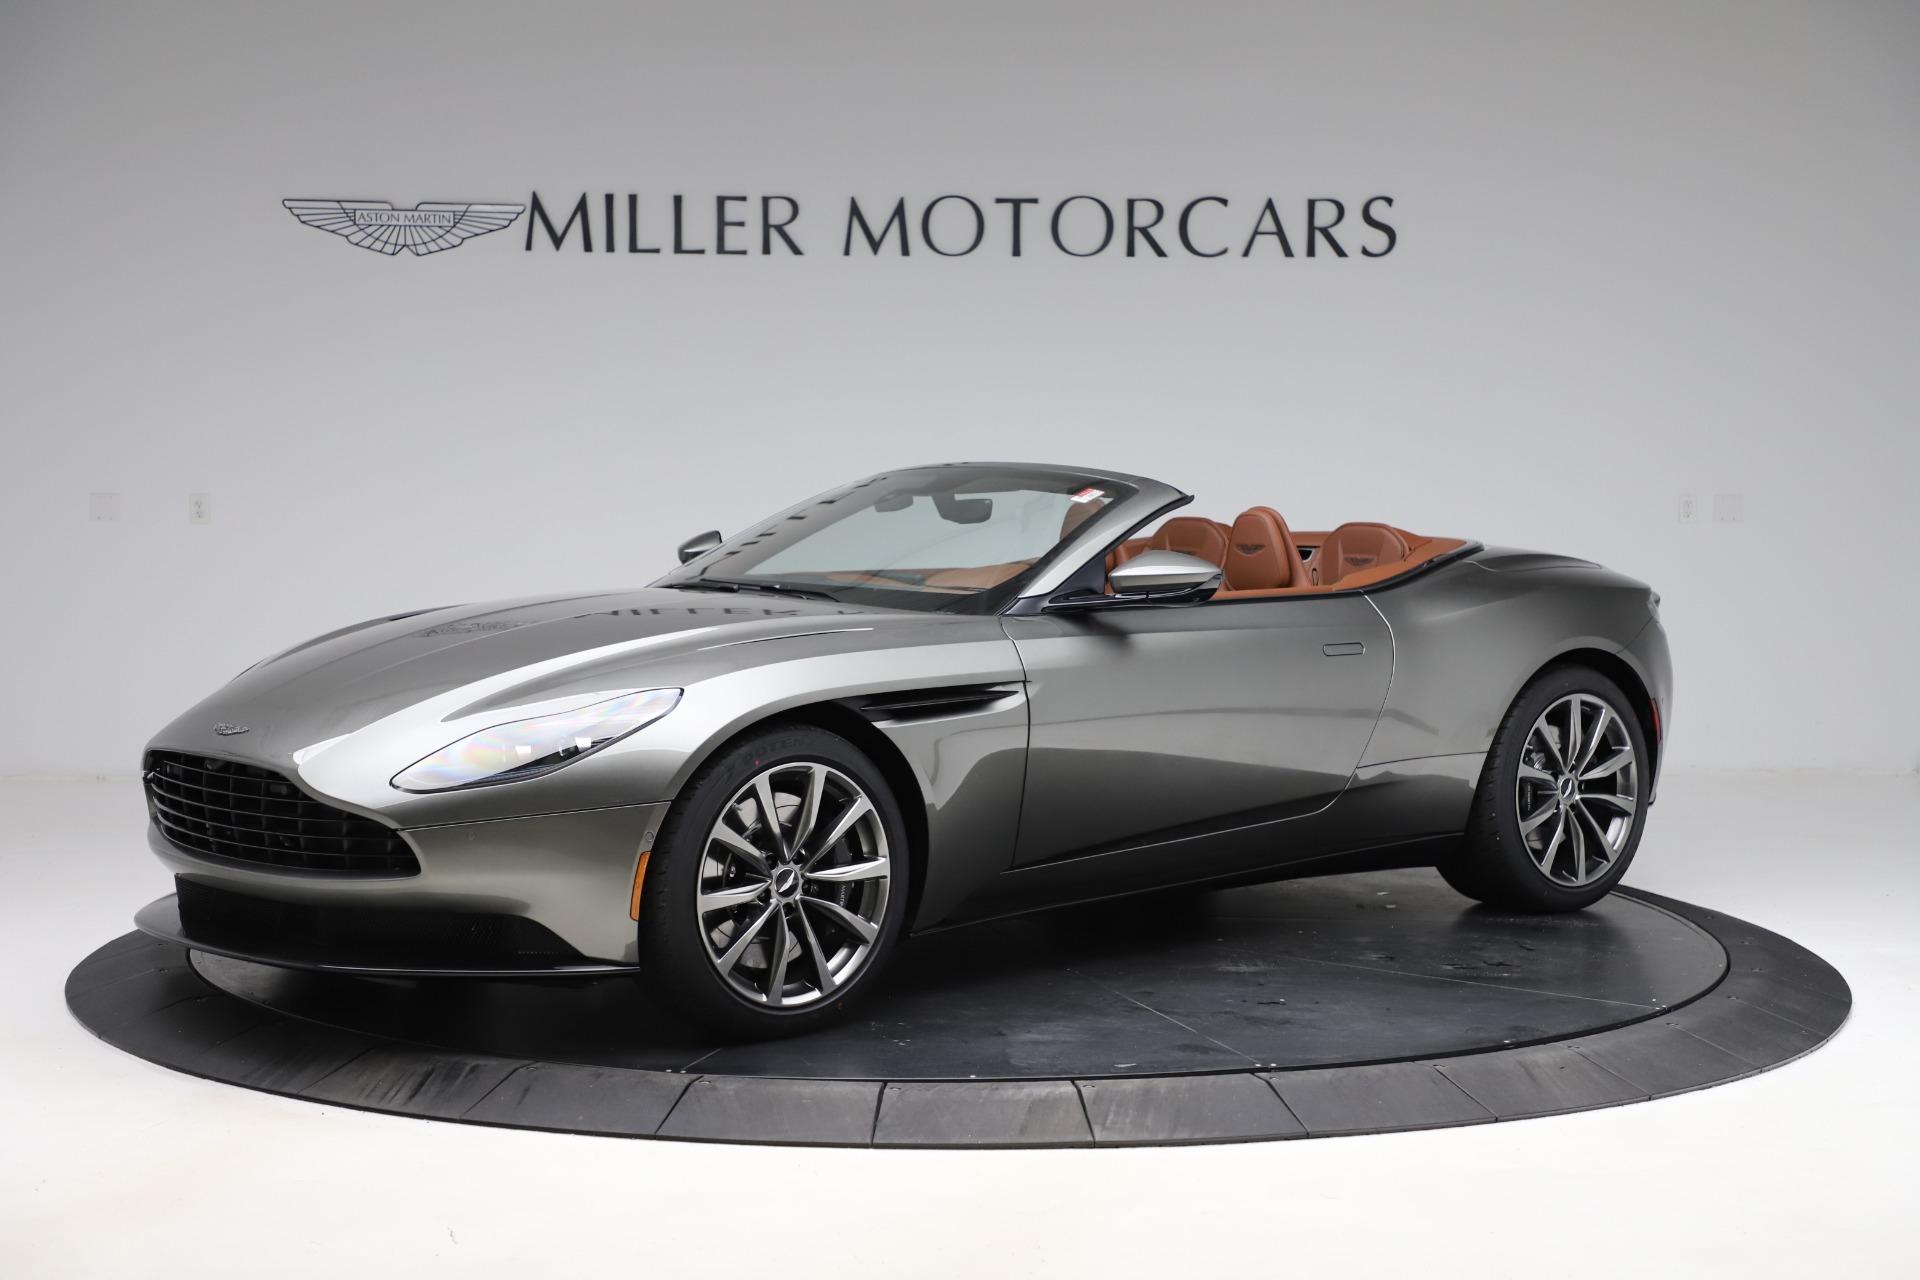 New 2020 Aston Martin Db11 Volante Convertible For Sale 264 266 Miller Motorcars Stock A1483